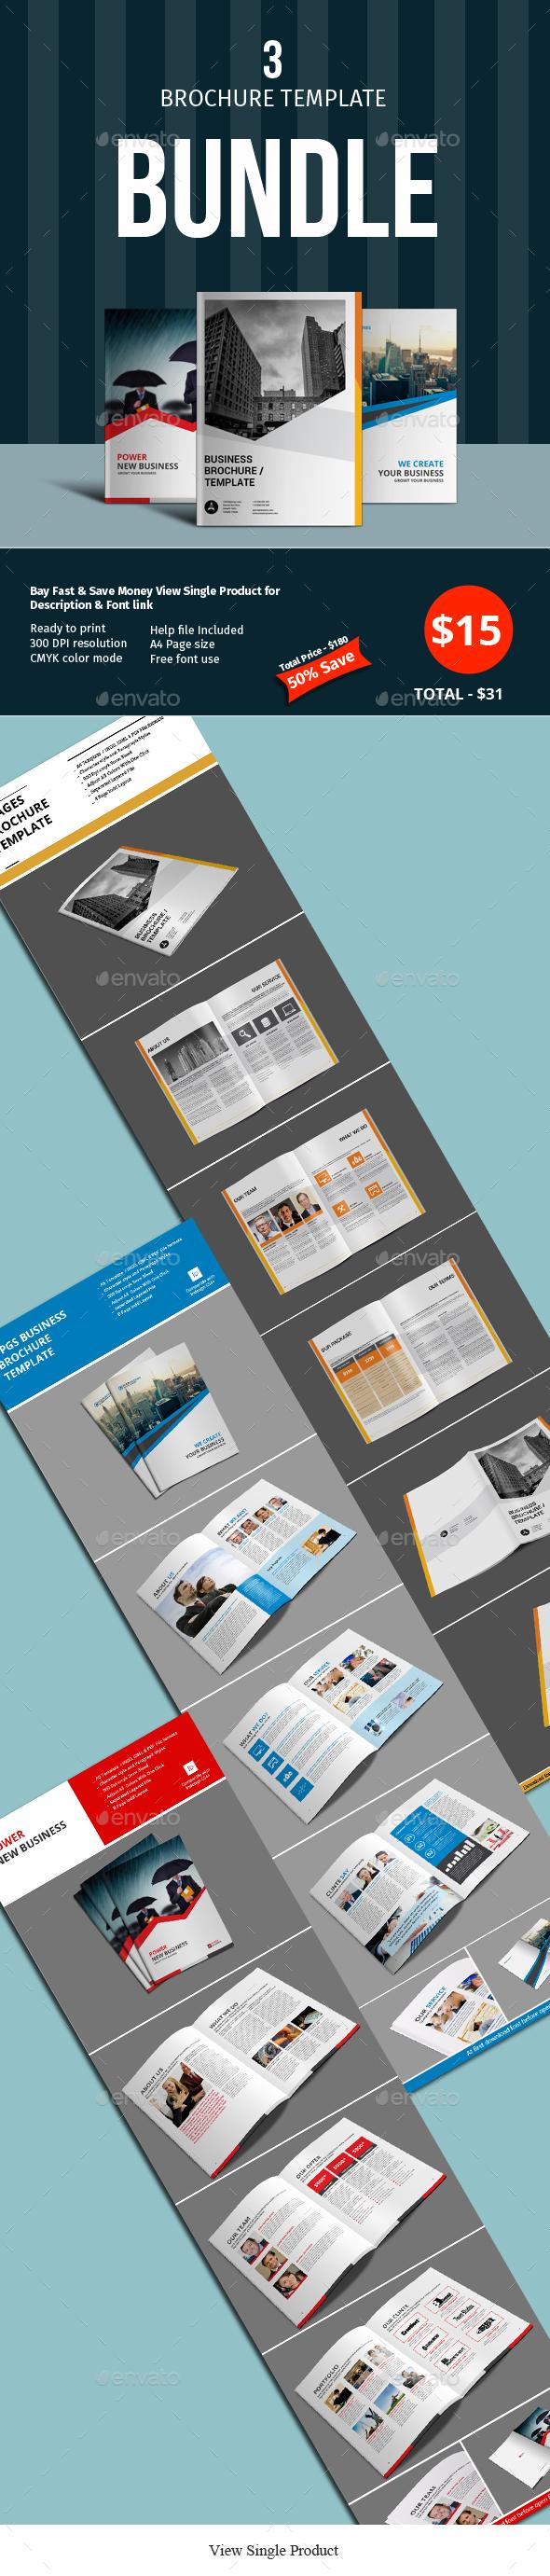 8 Pages 3 Brochure Template Bundle - Corporate Brochures